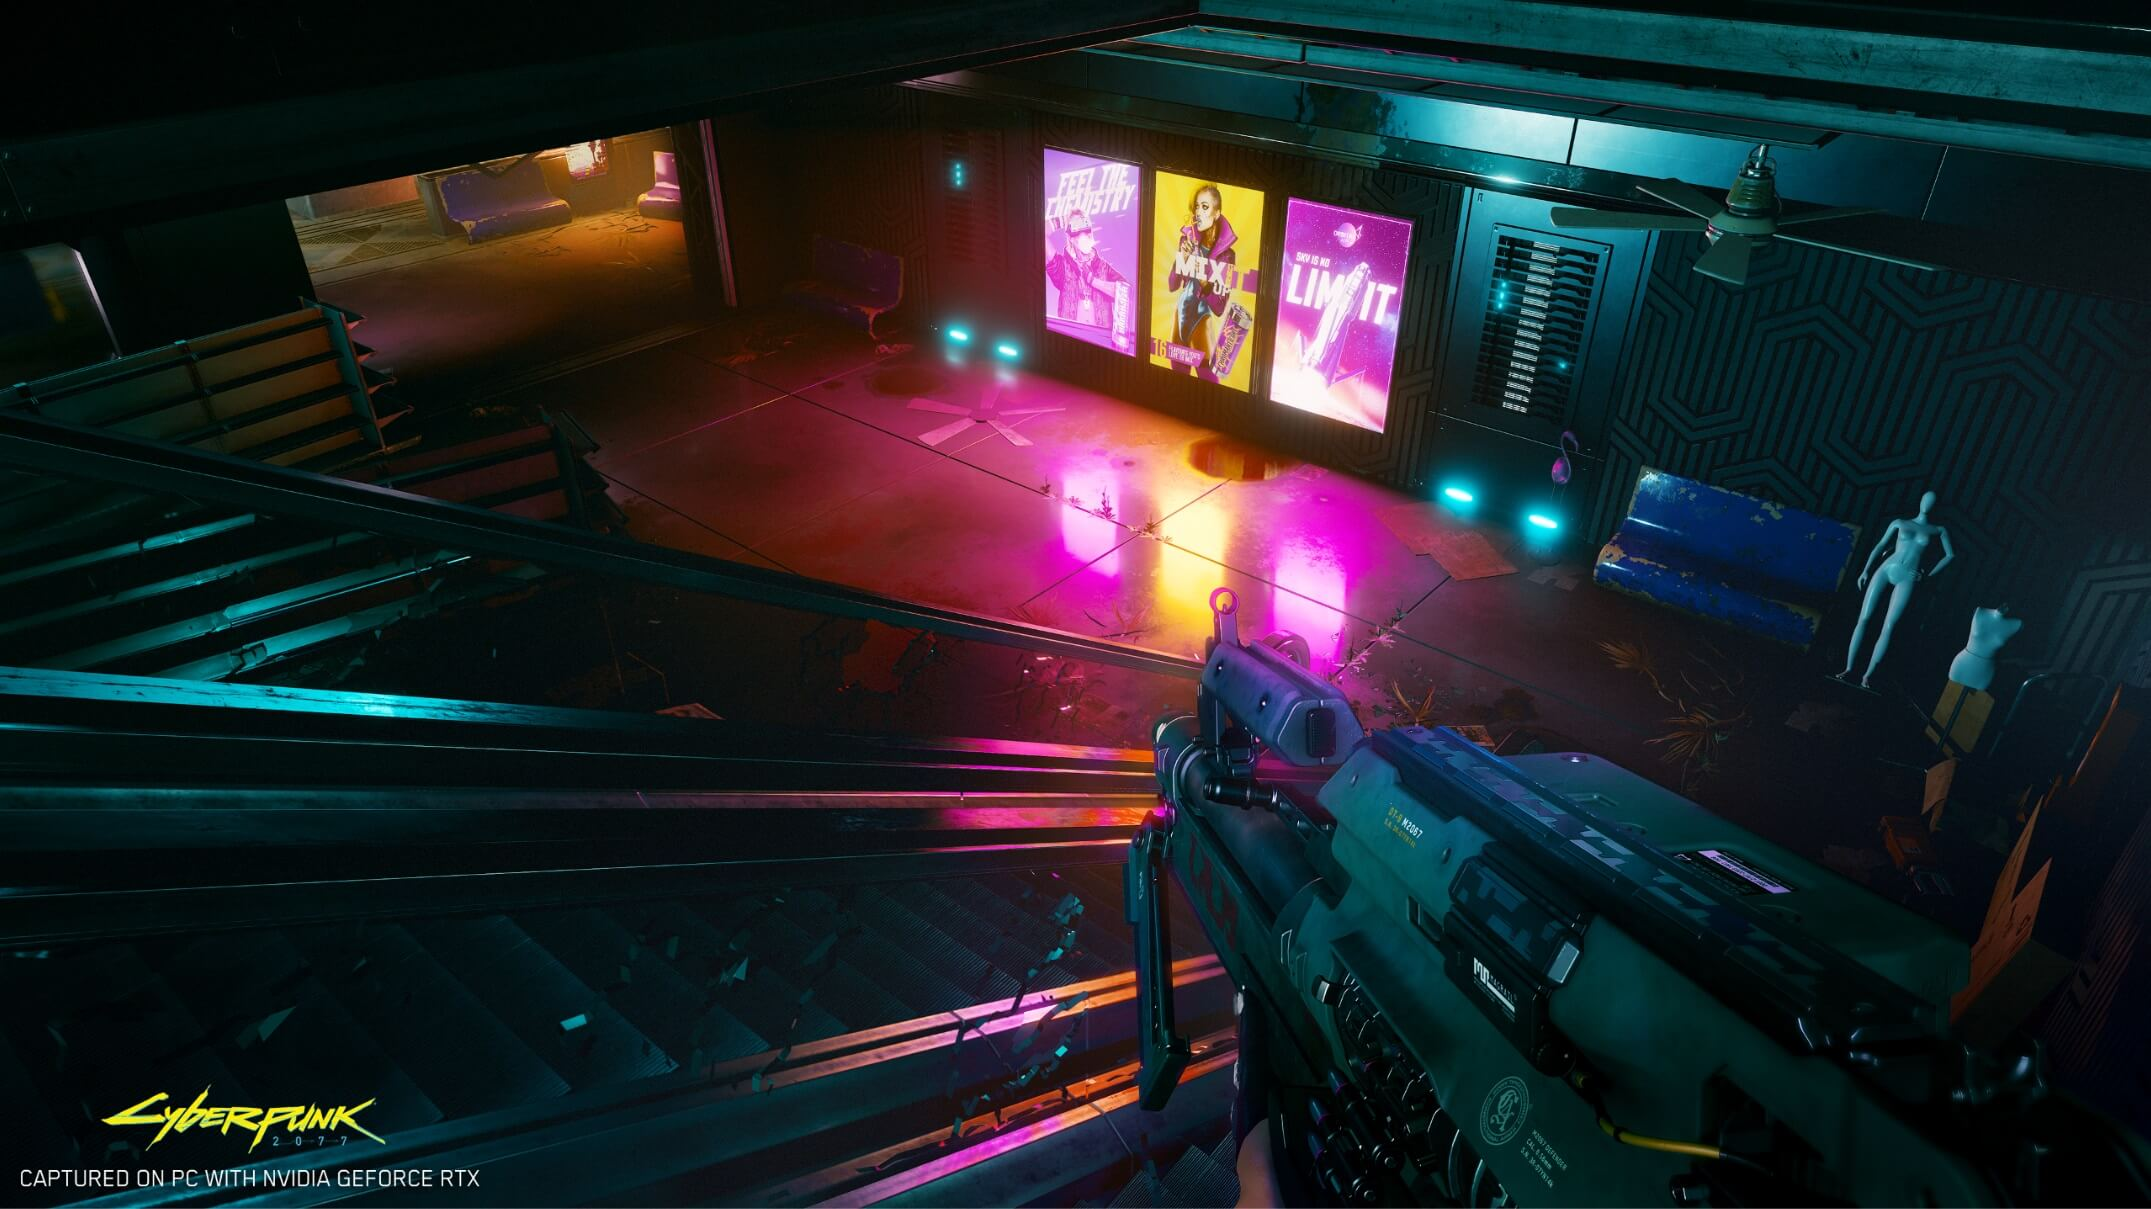 Cyberpunk 2077 tendrá raytracing gracias a CD PROJEKT RED y NVIDIA